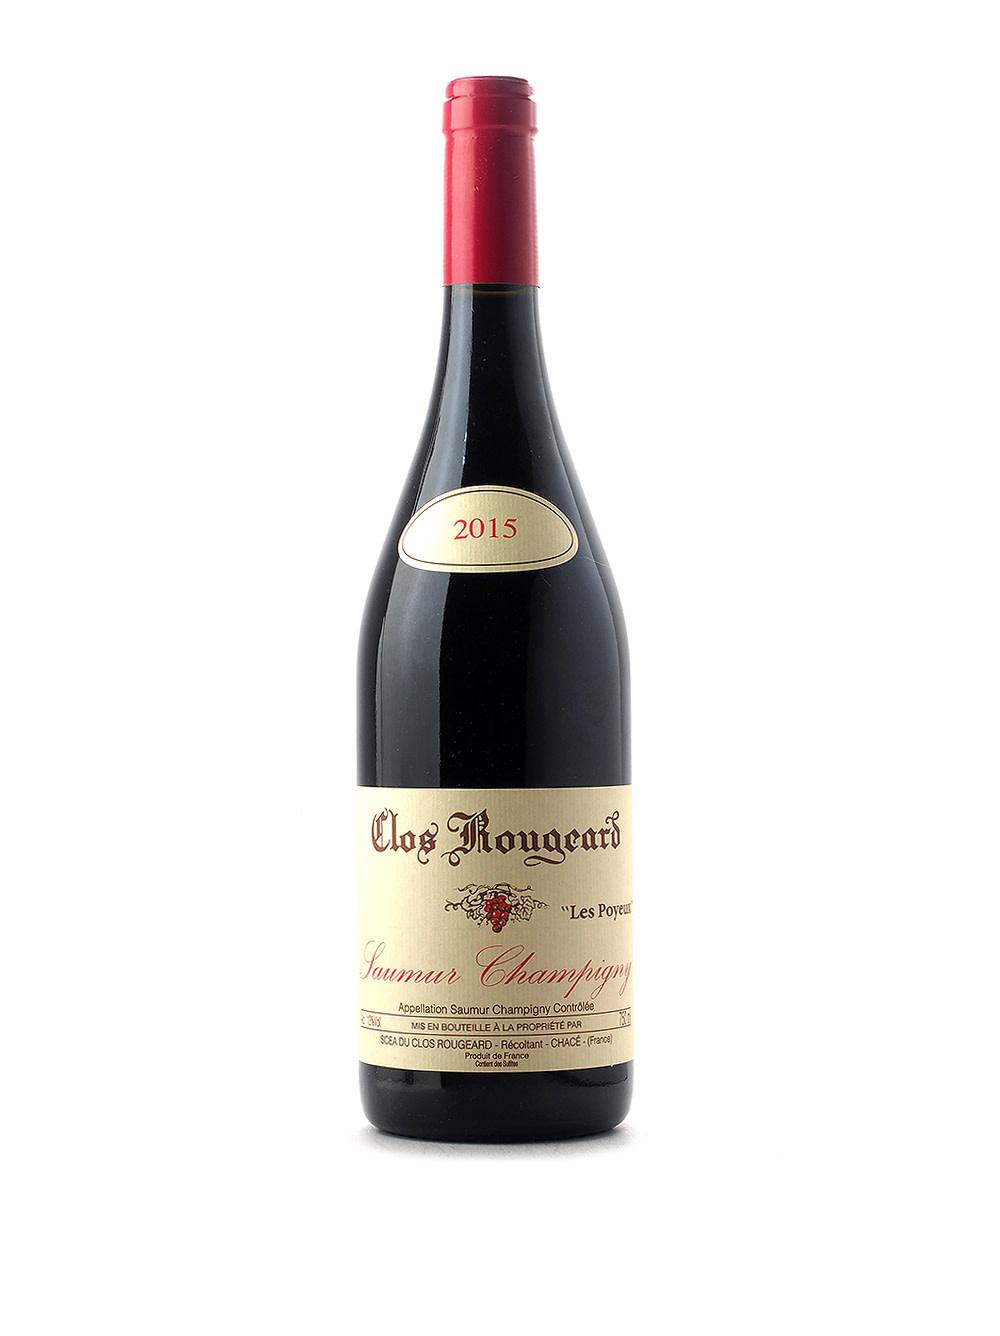 Clos Rougeard Saumur Champigny Les Poyeux 2015